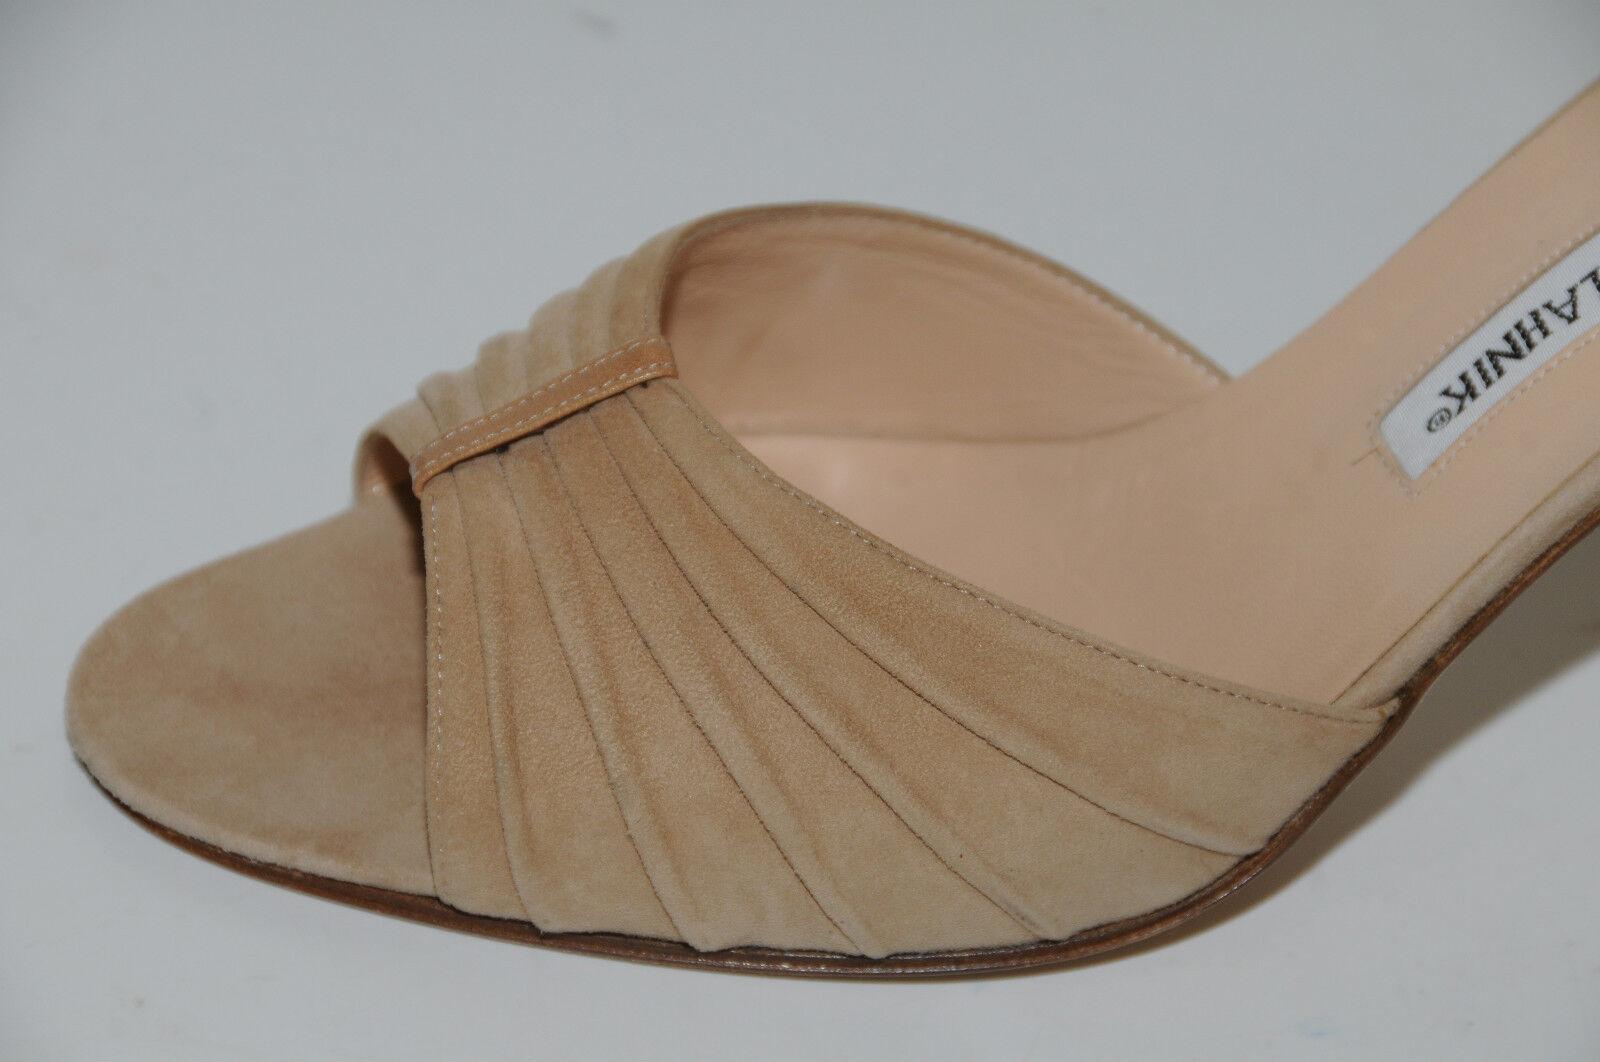 775 New MANOLO BLAHNIK SEDARABY Camel Flesh NUDE Beige Beige Beige marron Suede chaussures 40 98ddd2